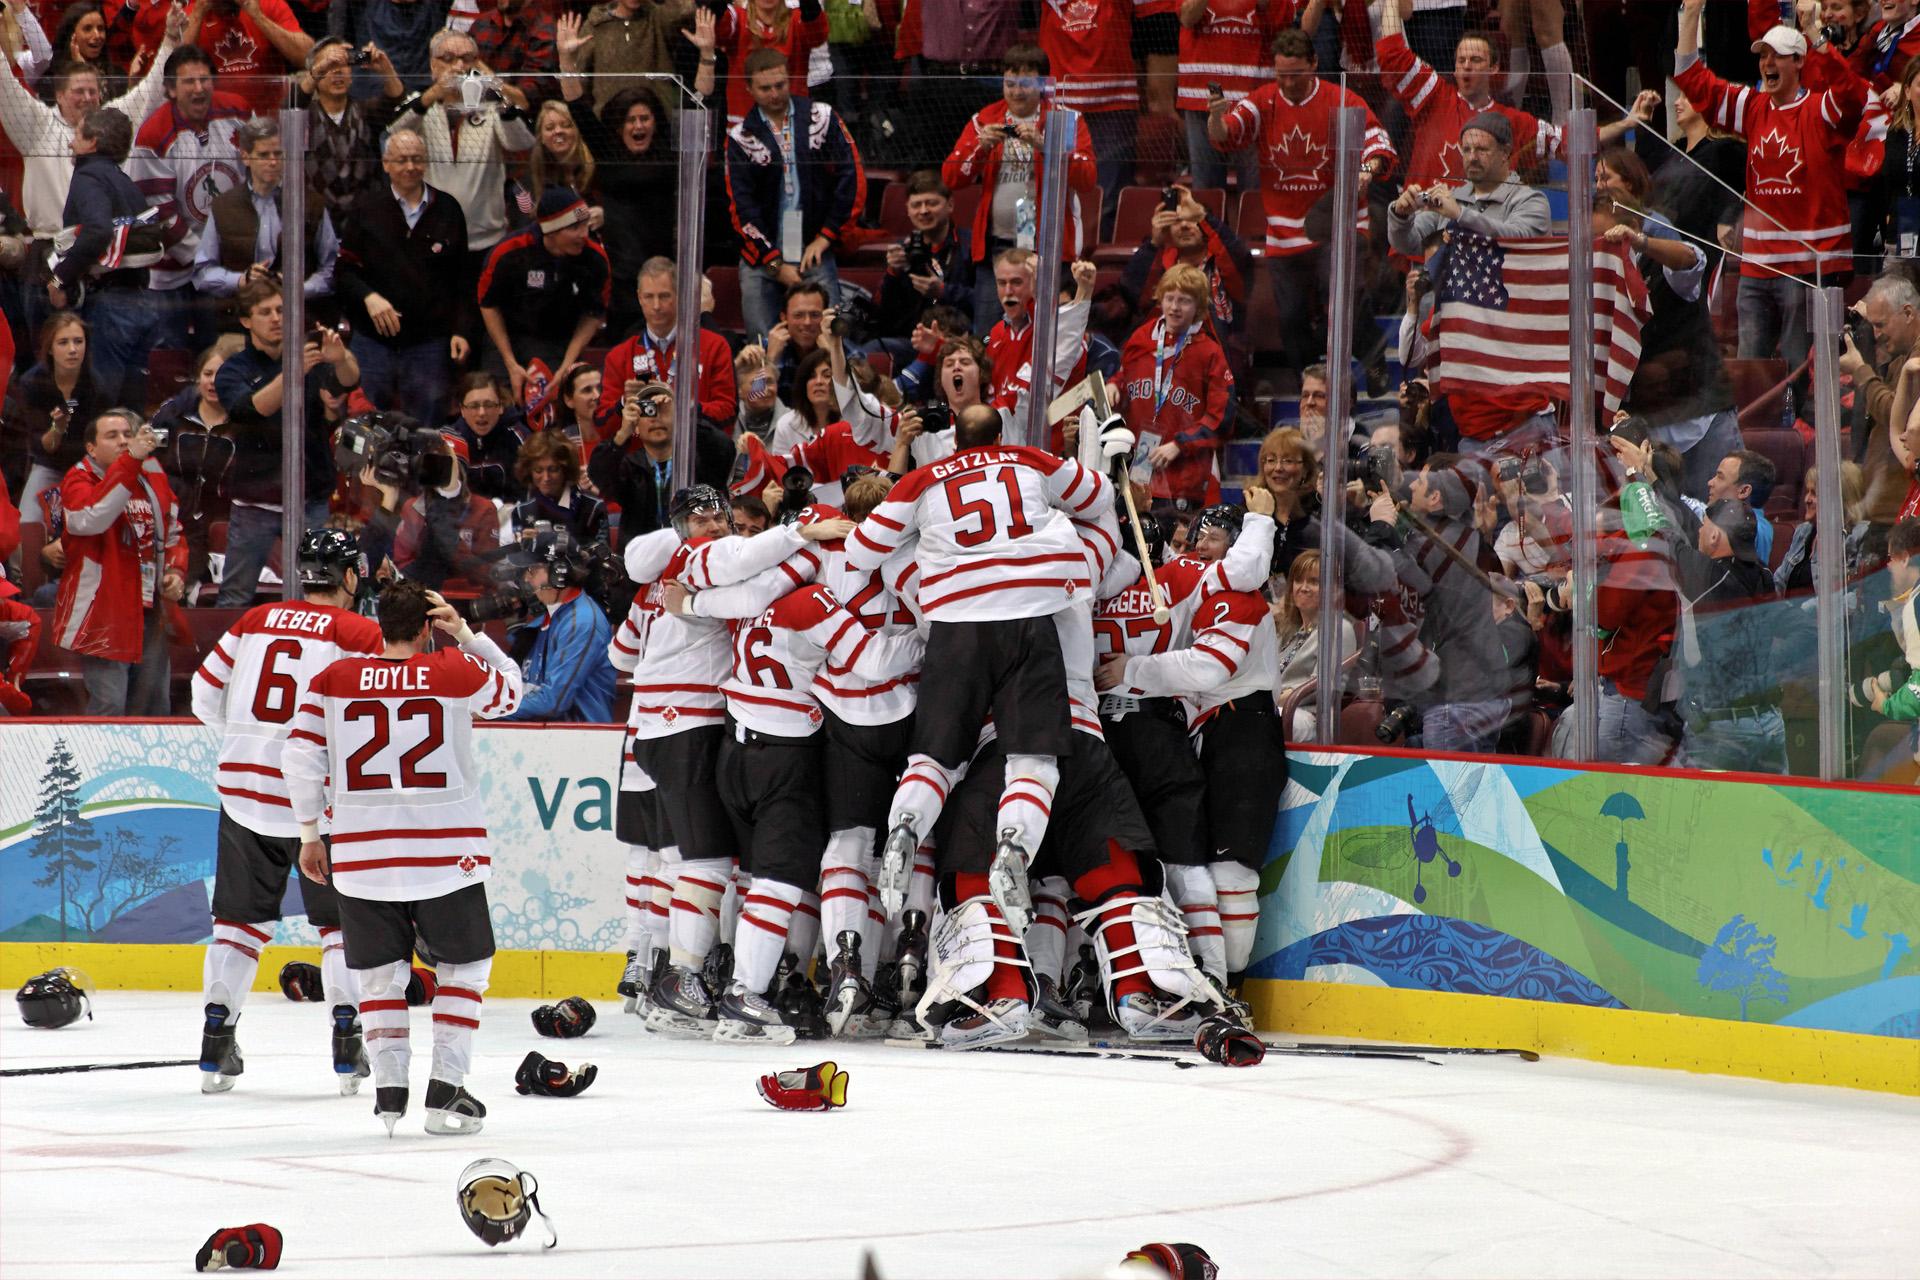 Sochi Winter Olympics Hockey Betting Preview